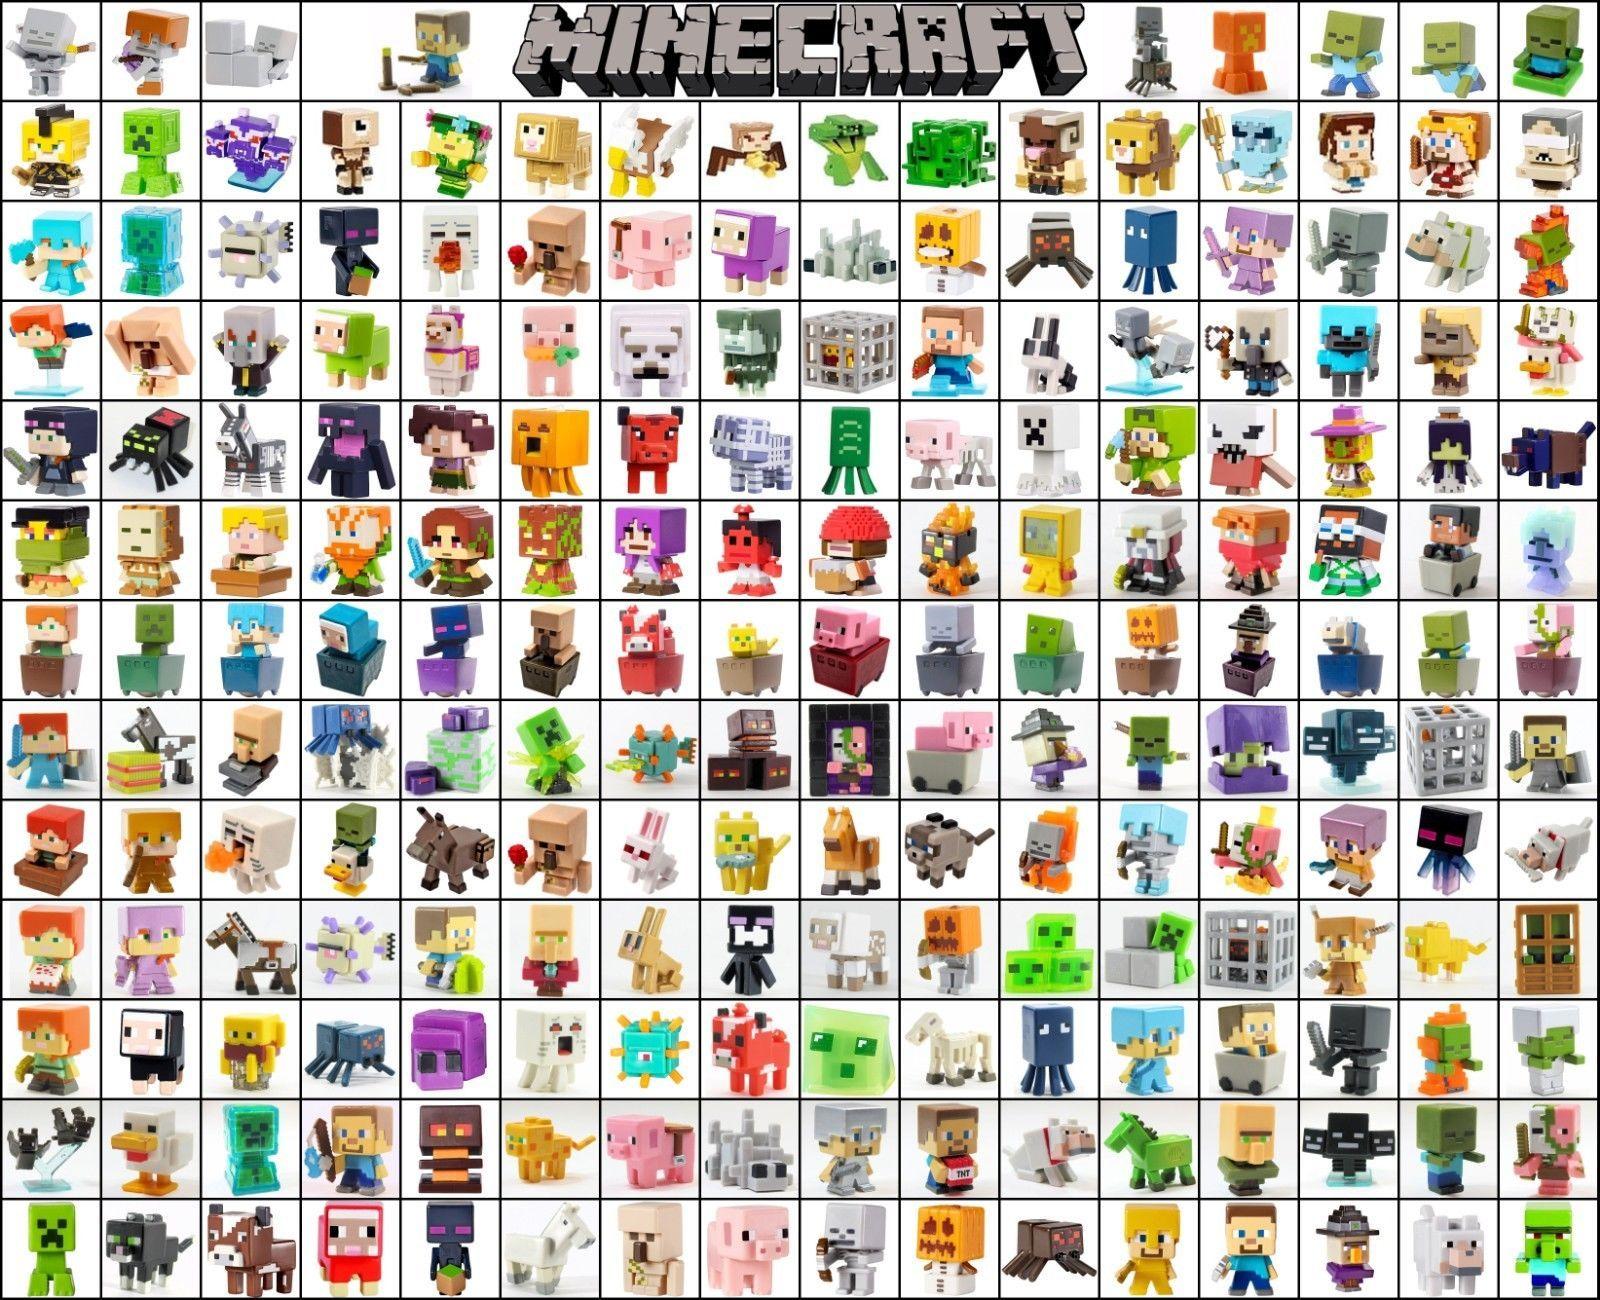 Minecraft Mini Figure Series 1 2 3 4 5 6 7 8 9 10 11 12 Assortment